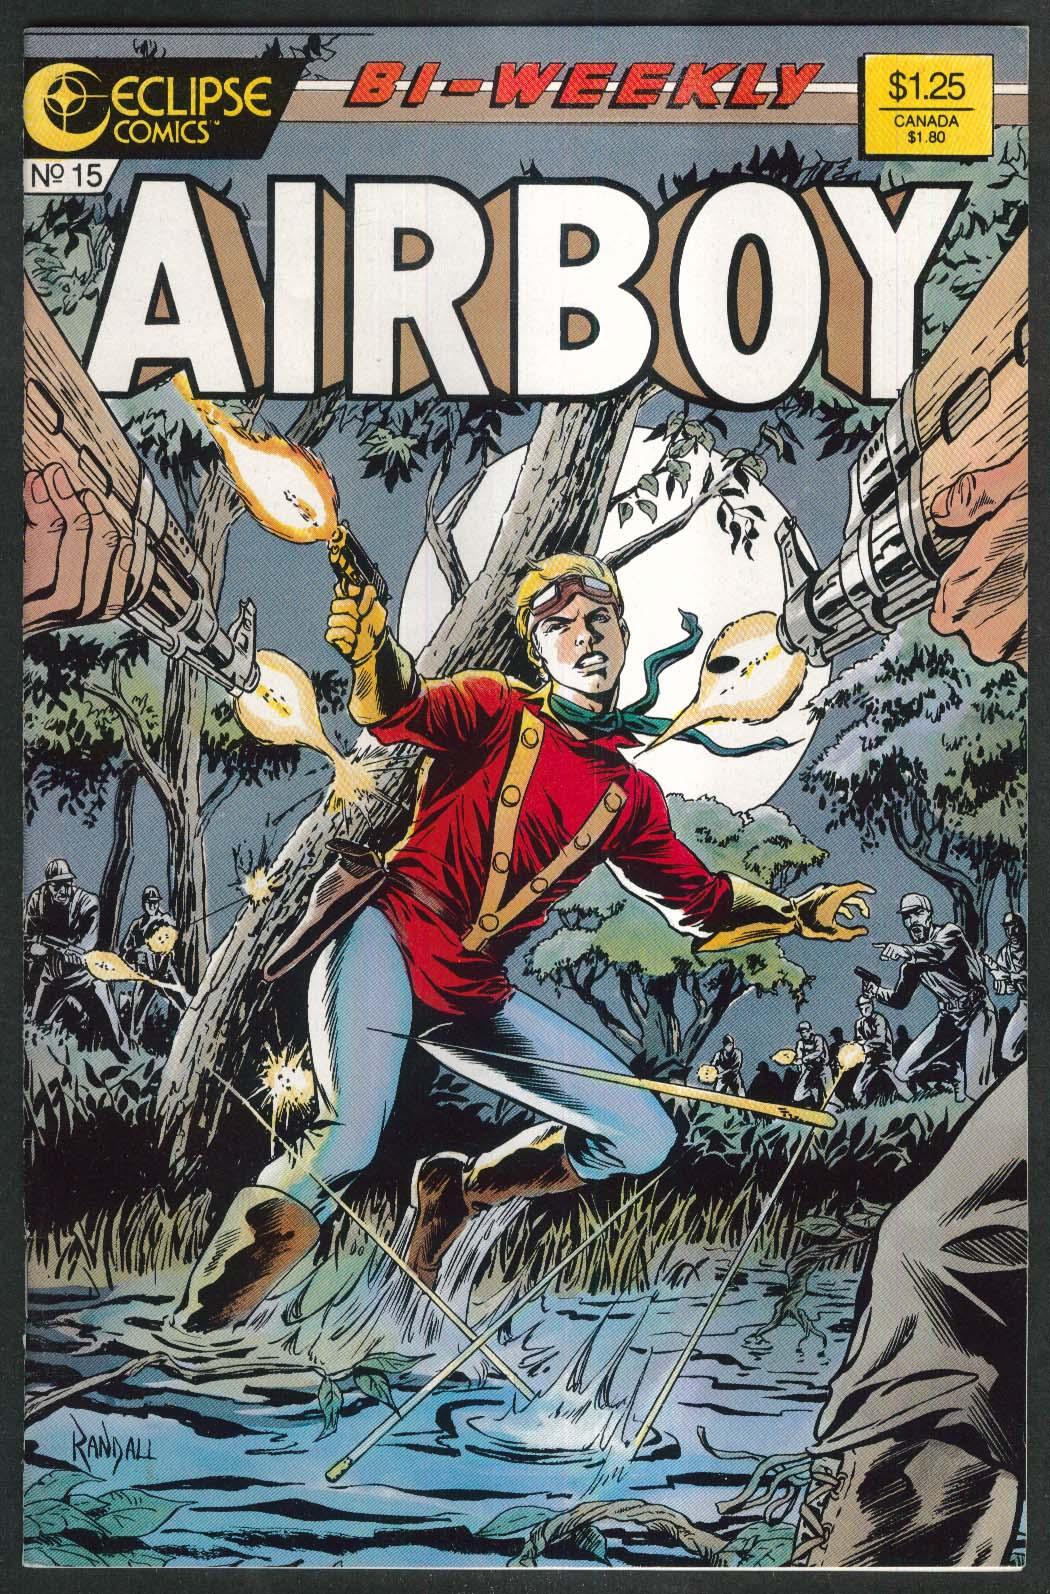 AIRBOY #15 Eclipse comic book 2/10 1987